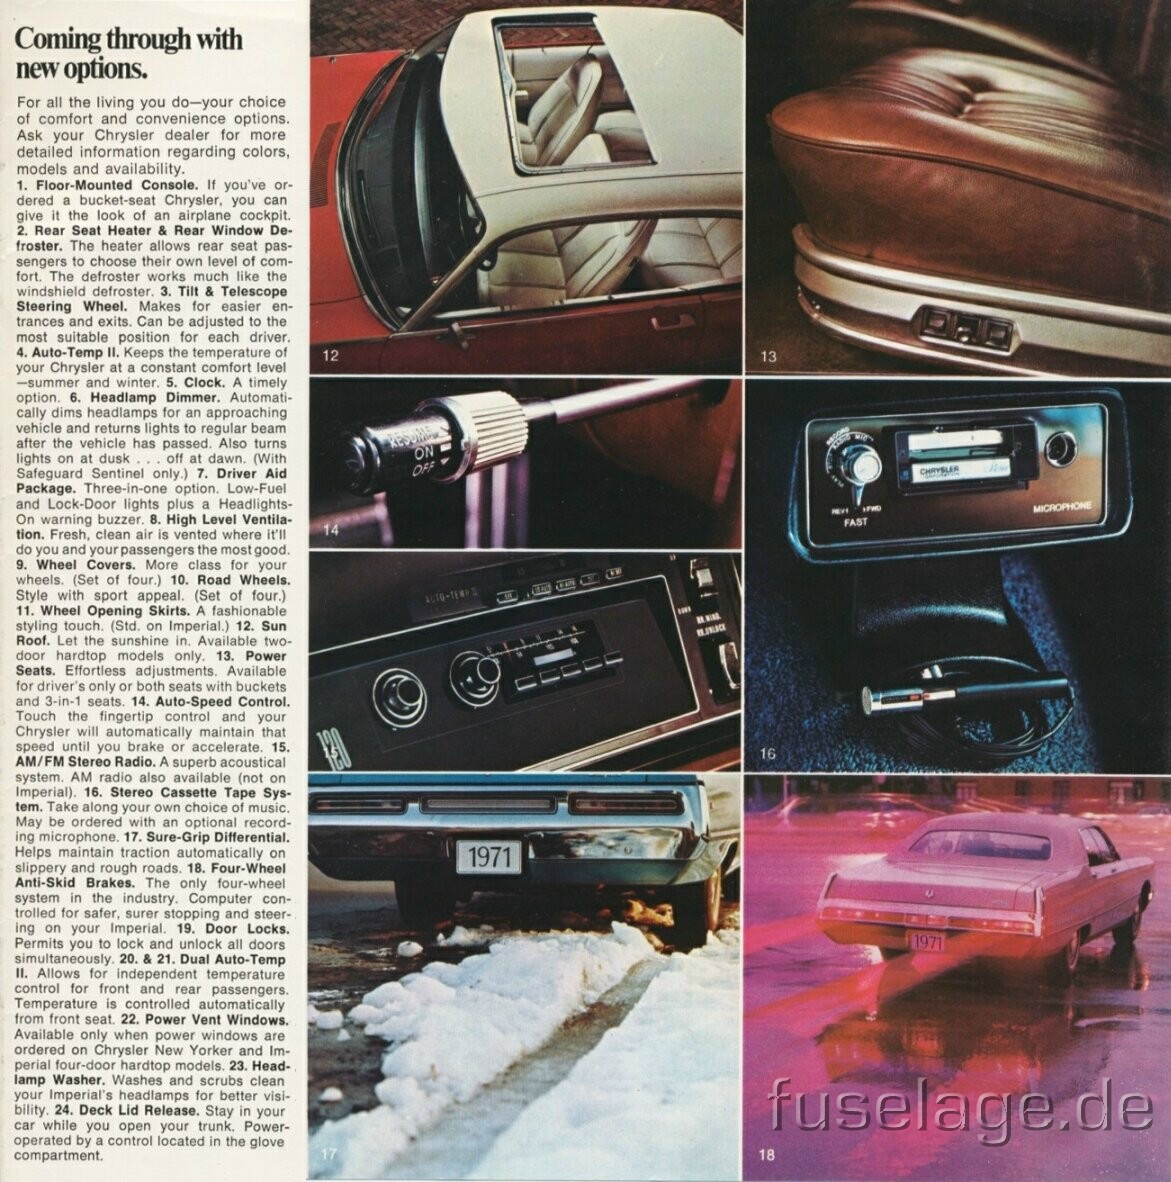 NEW Chrysler Imperial Concept (hi-res Photos)